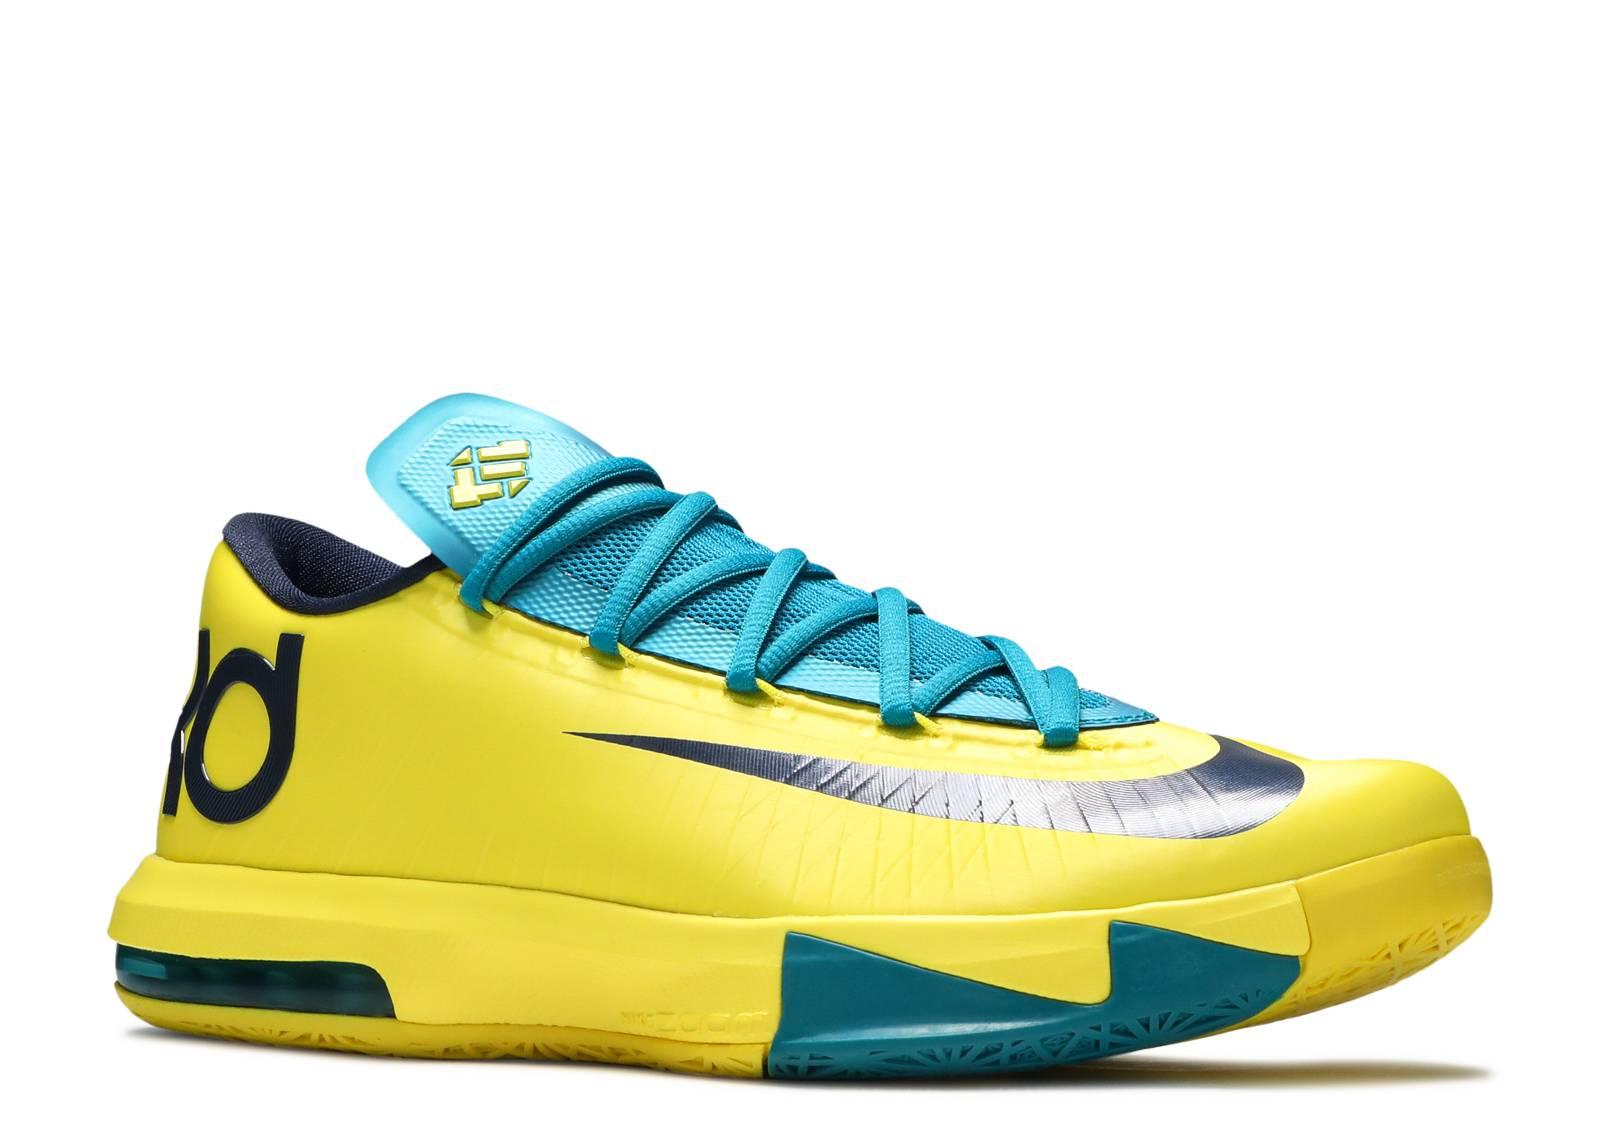 Nike Shoes Yellowing